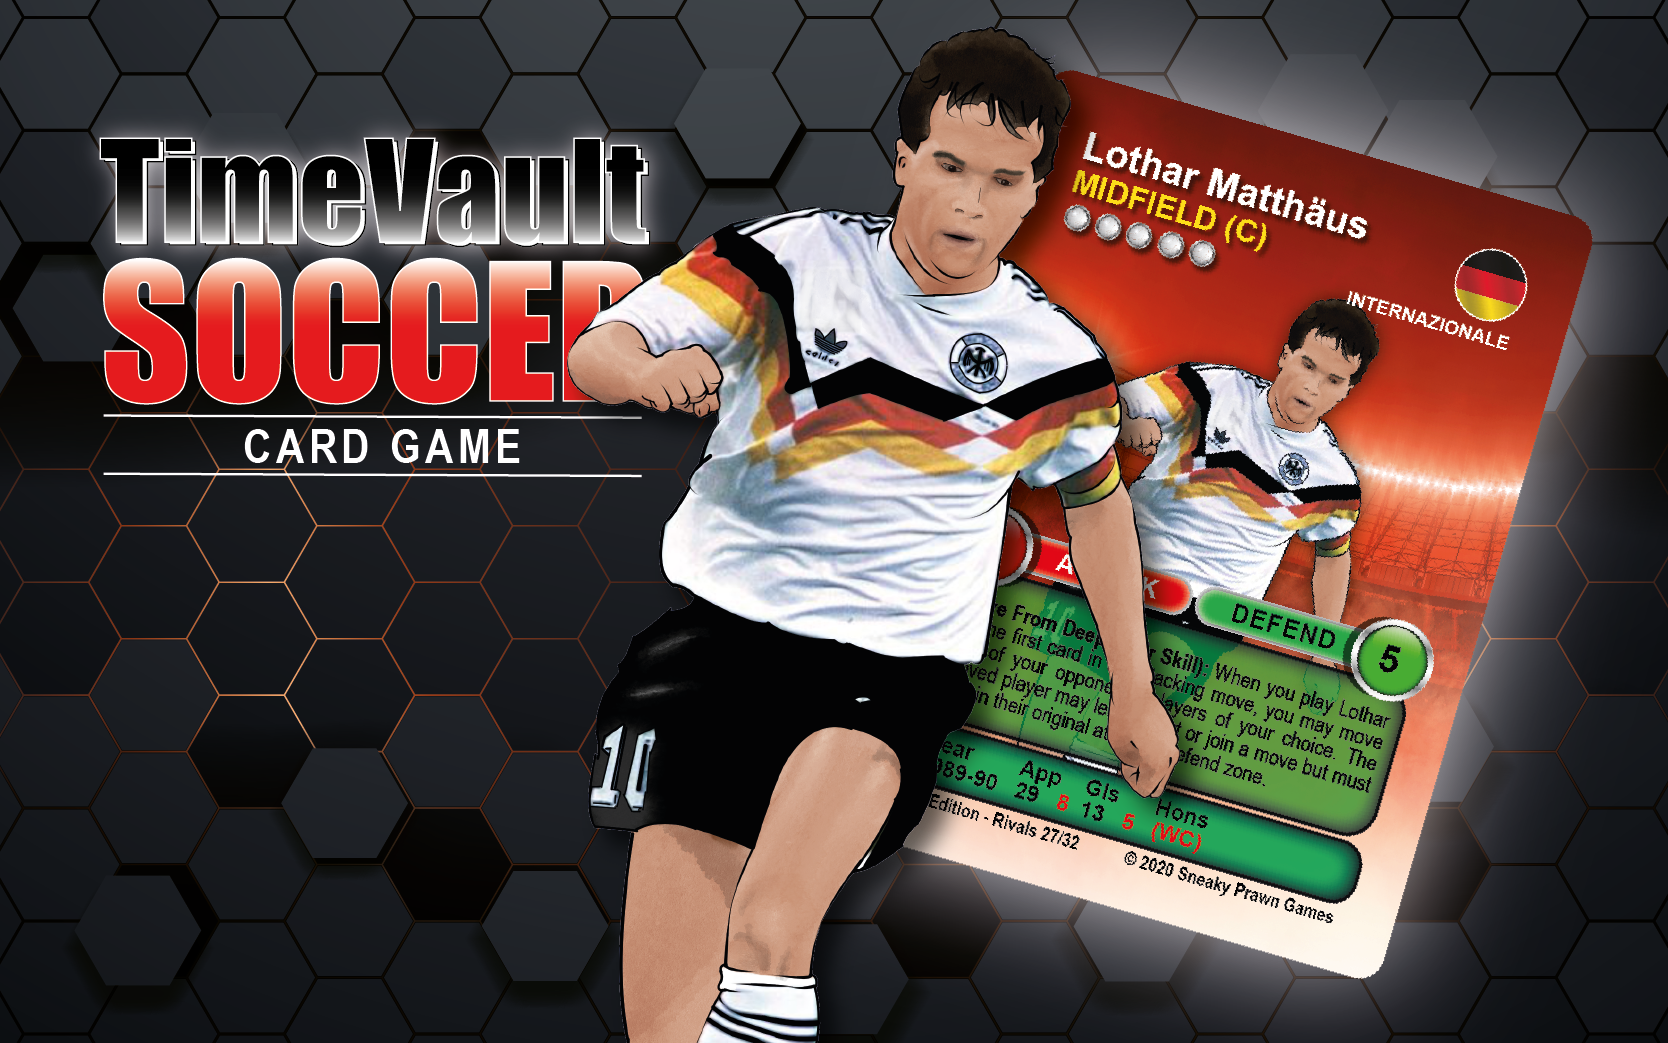 Lothar Matthaus football card game